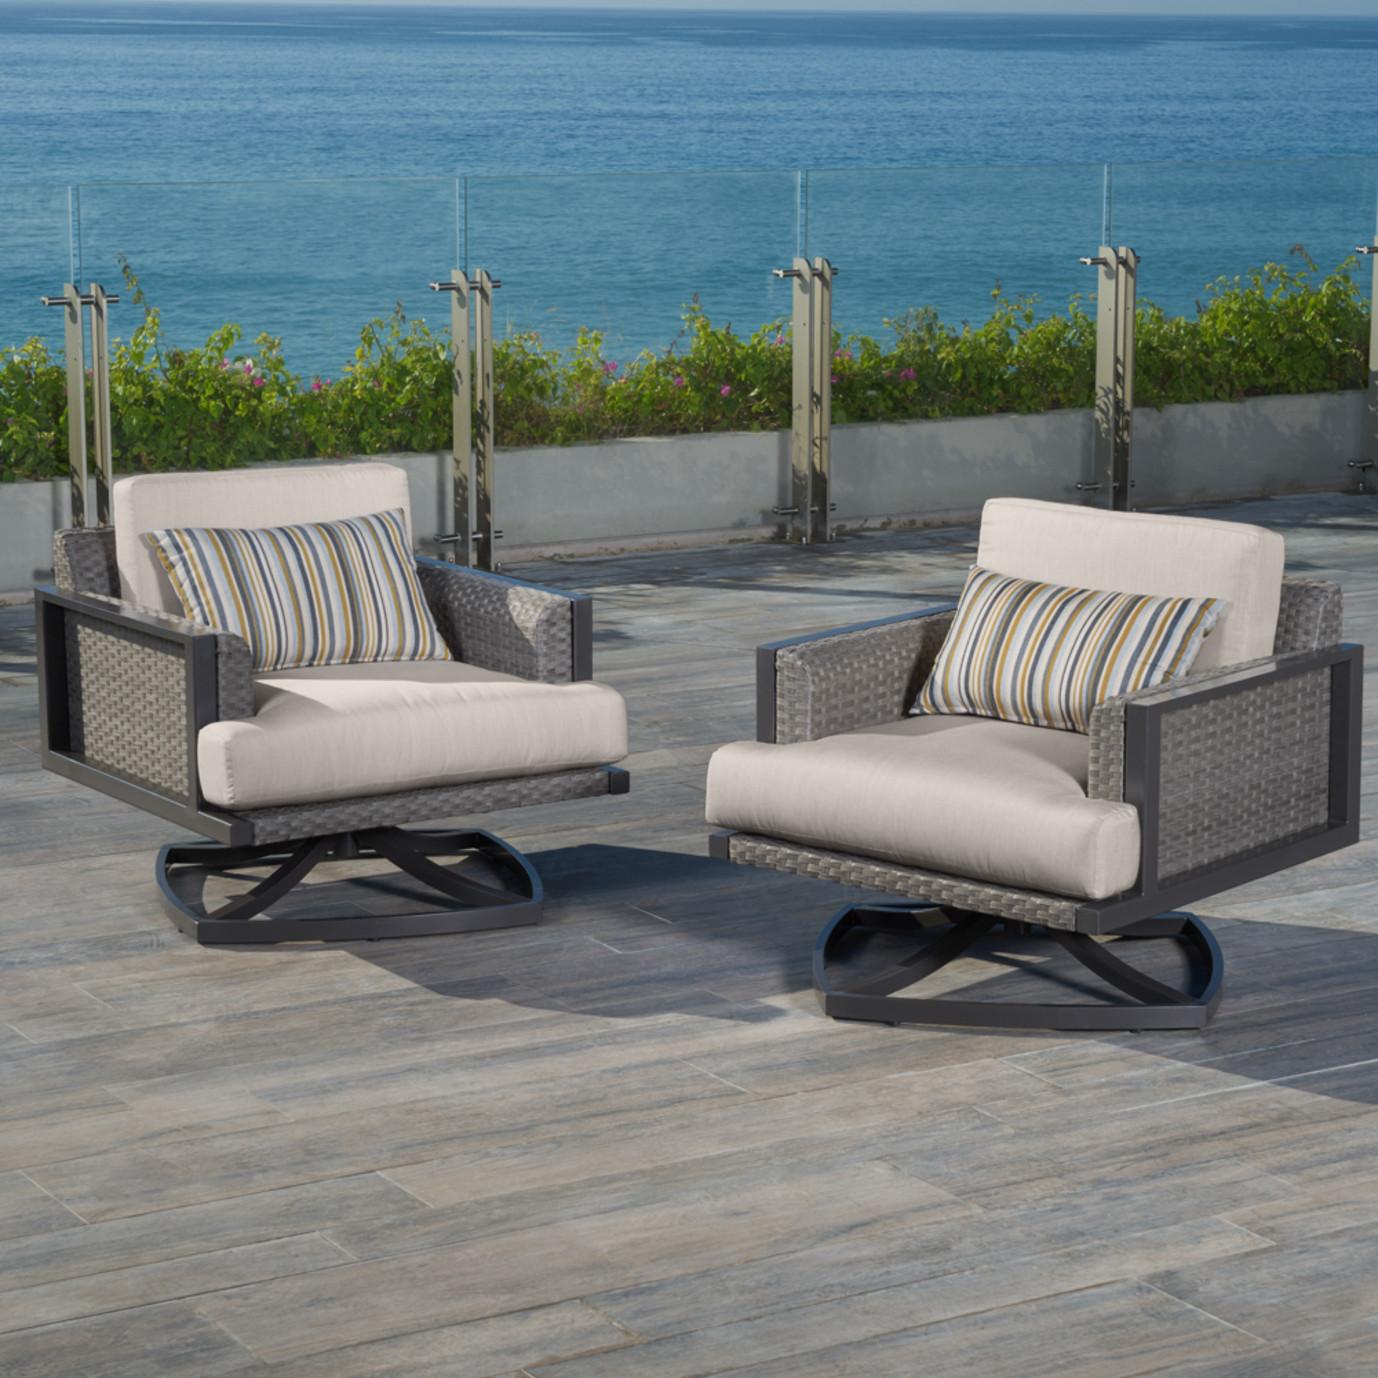 Vistano™ Motion Club Chairs